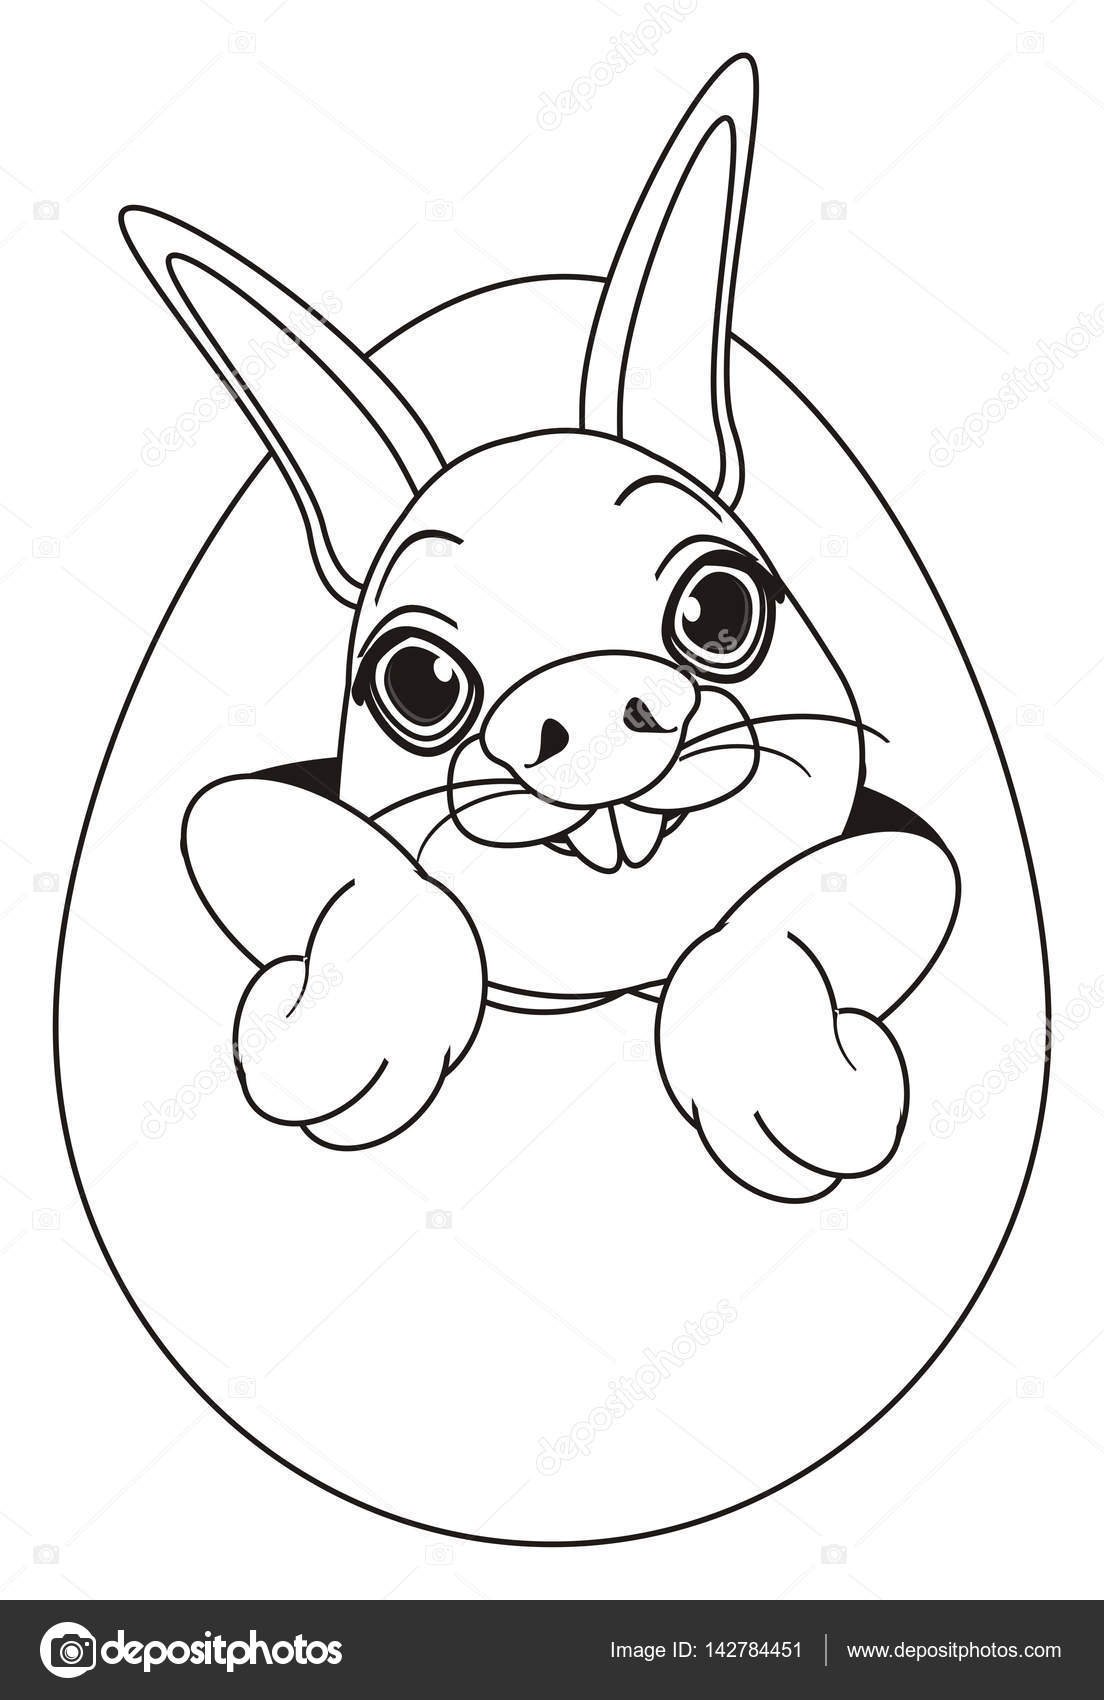 Burun Yumurta üzerinde Tavşan Boyama Stok Foto Tatty77tatty